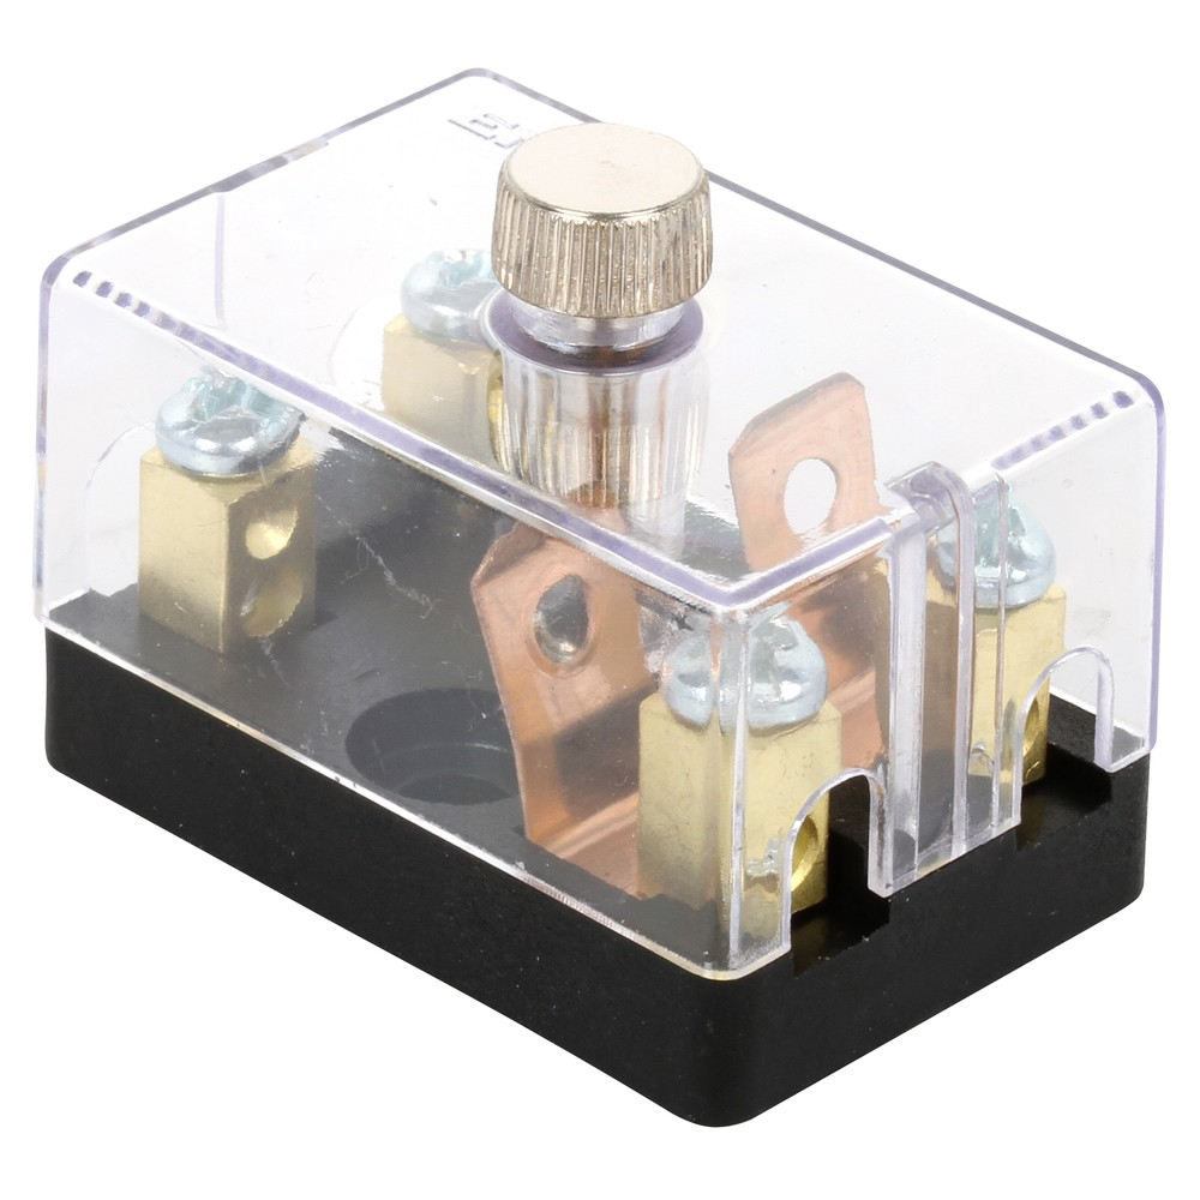 FUSE BOX 2-PART CERA/SCREW (ST100031)